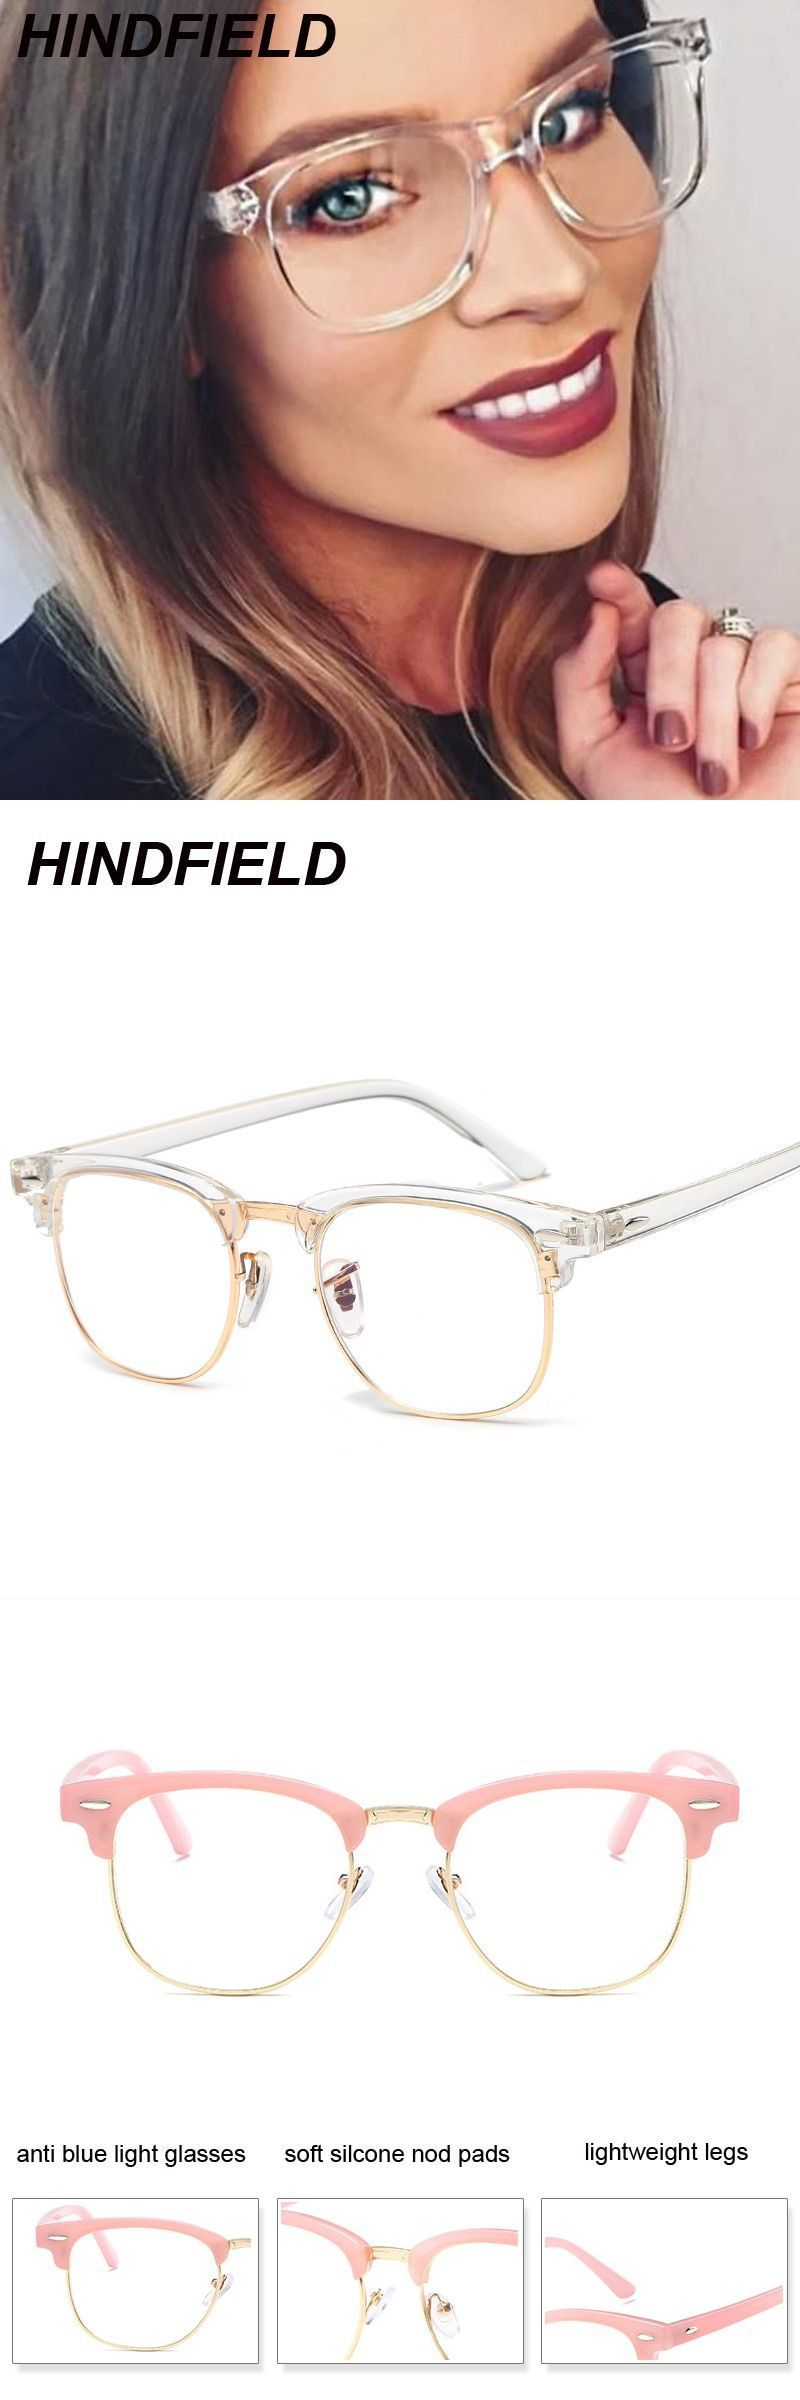 5033e0ff61d Korean fake glasses frames women transparent oculos clear lens square glasses  fashion optical frame eyeglasses oculos  frames  eyewear  accessories   plastic ...